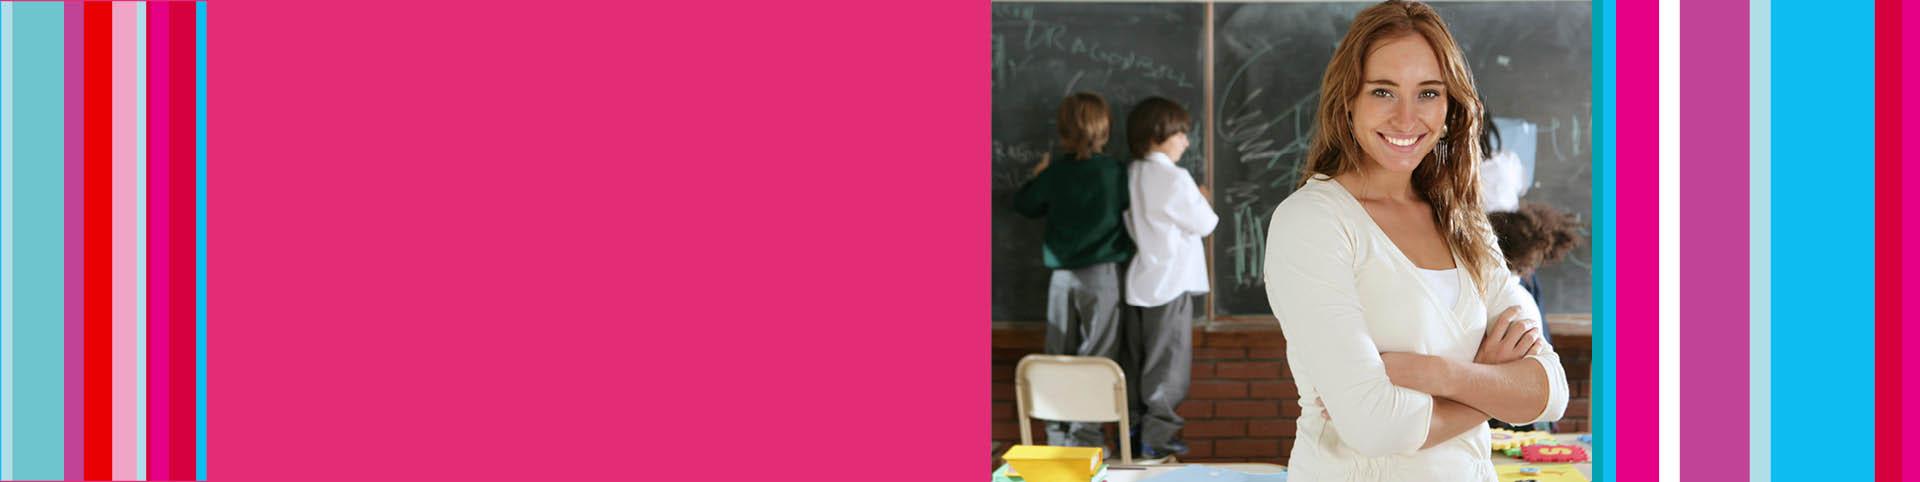 Sexualkunde unterrichtsmaterial grundschule